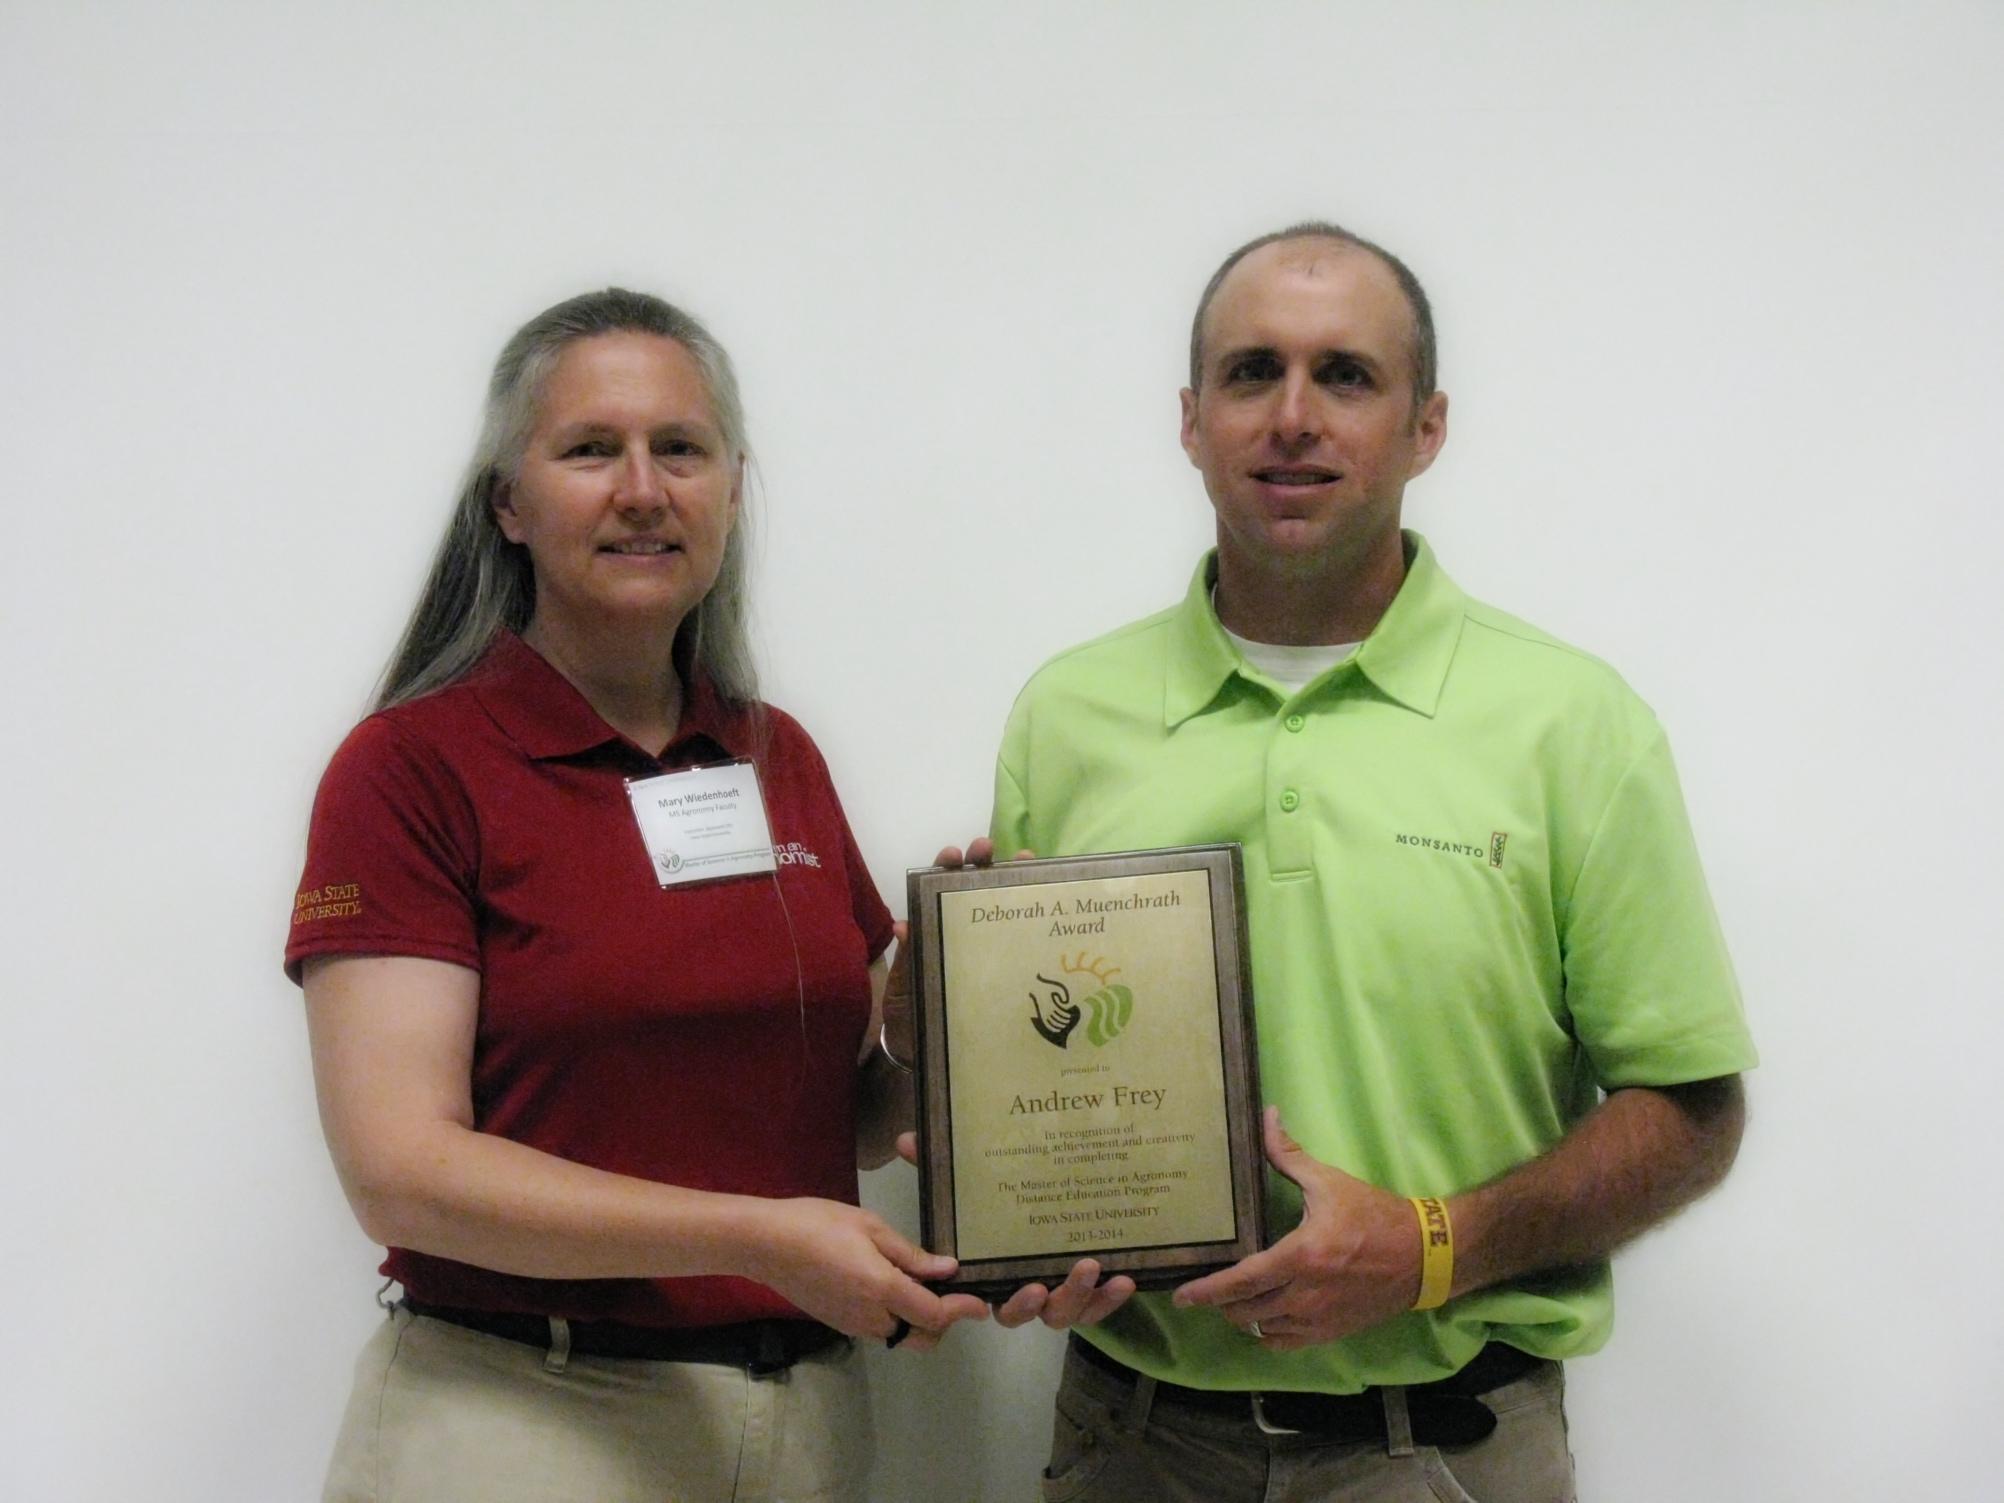 Frey receiving Muenchrath award